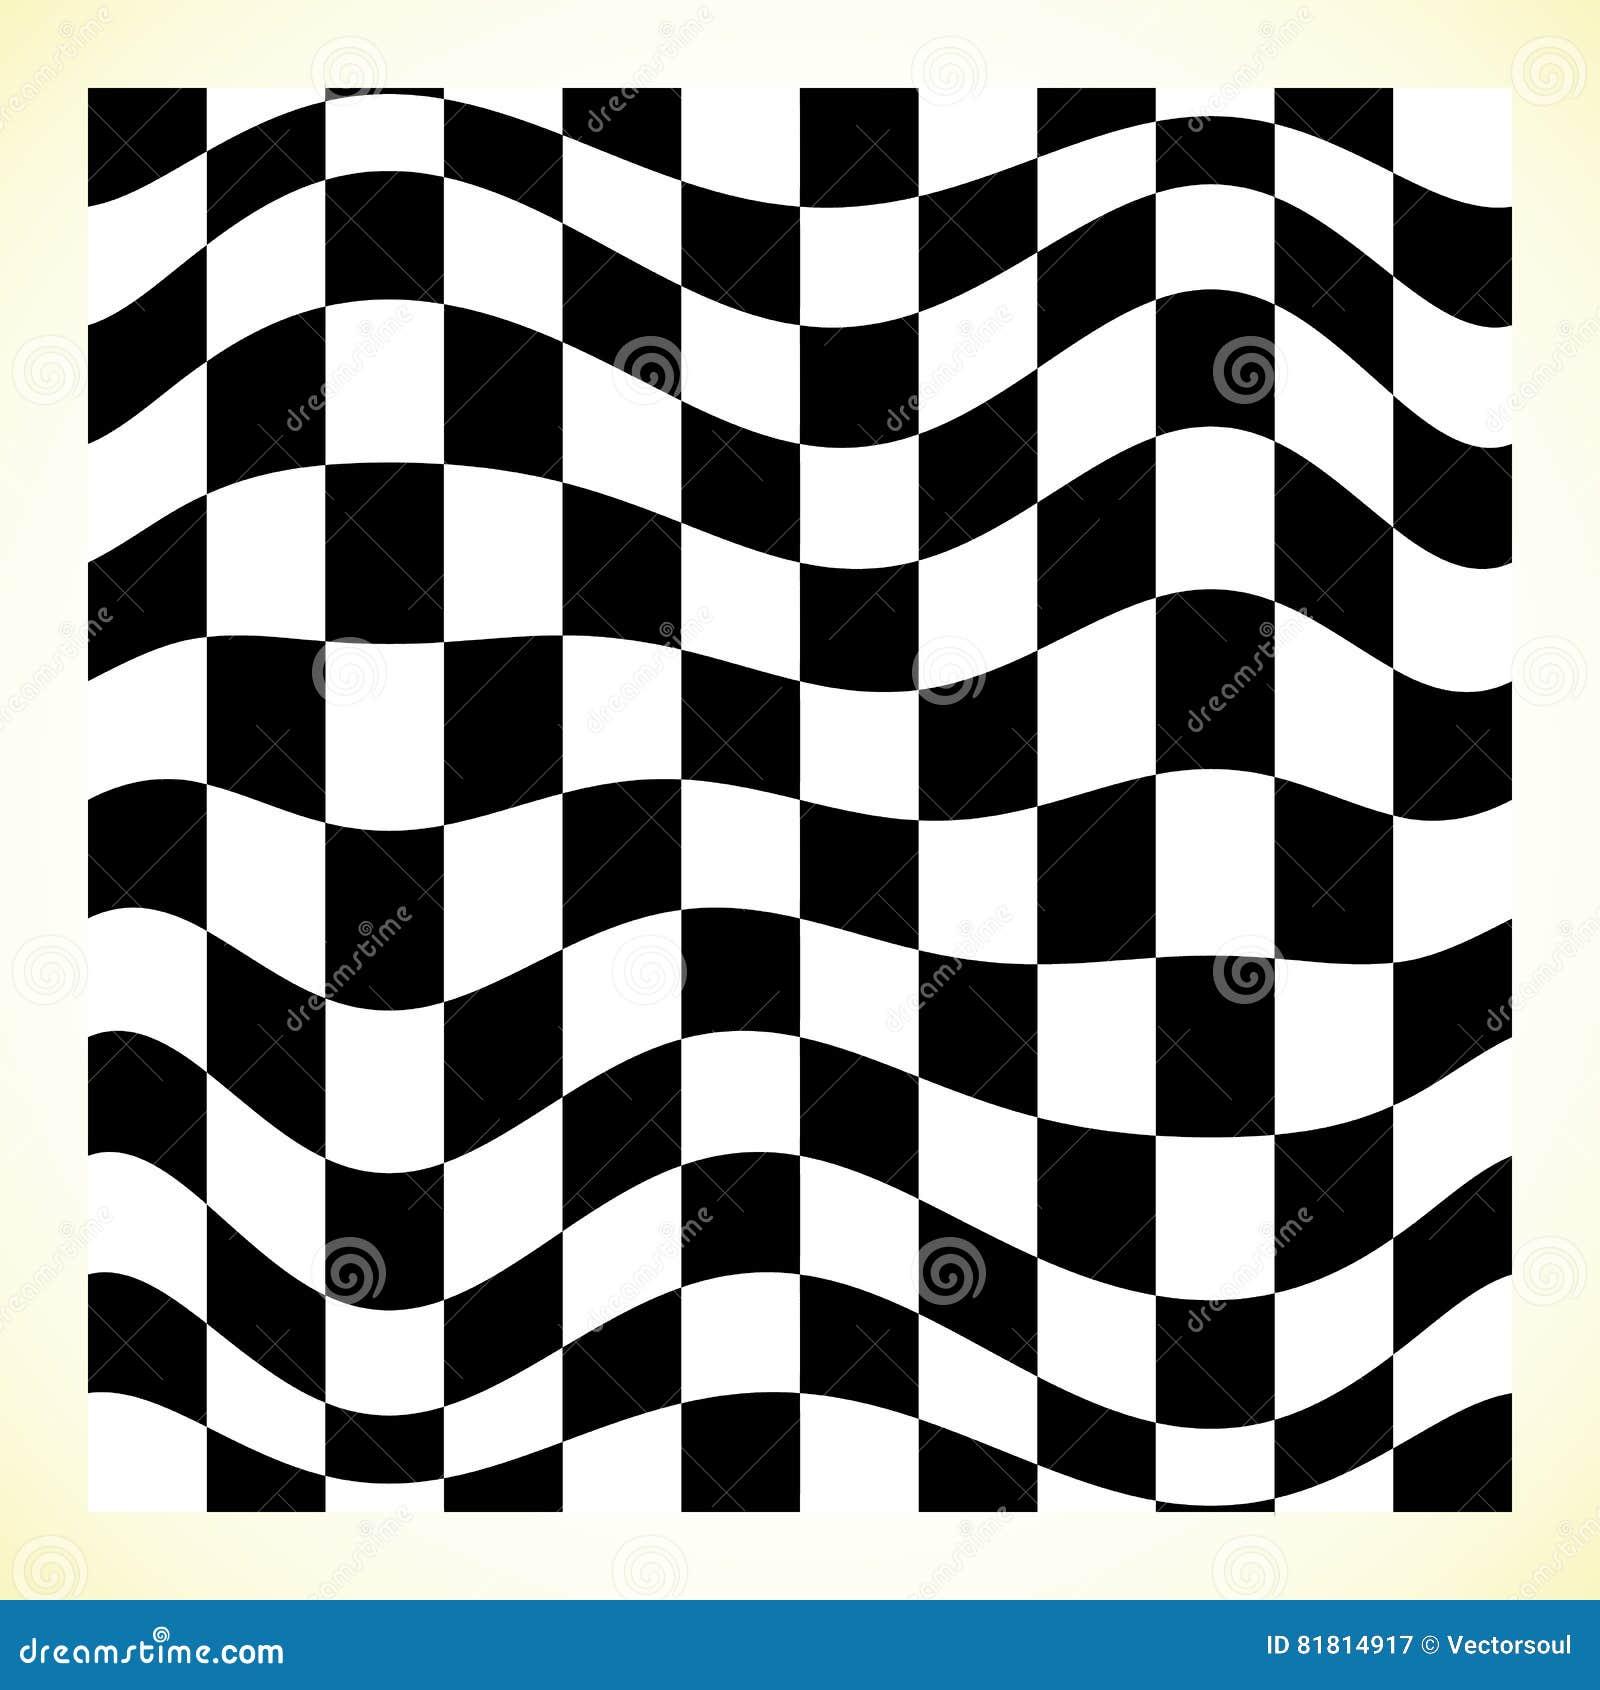 Checkered шахматная доска картины, доска контролера с искажением